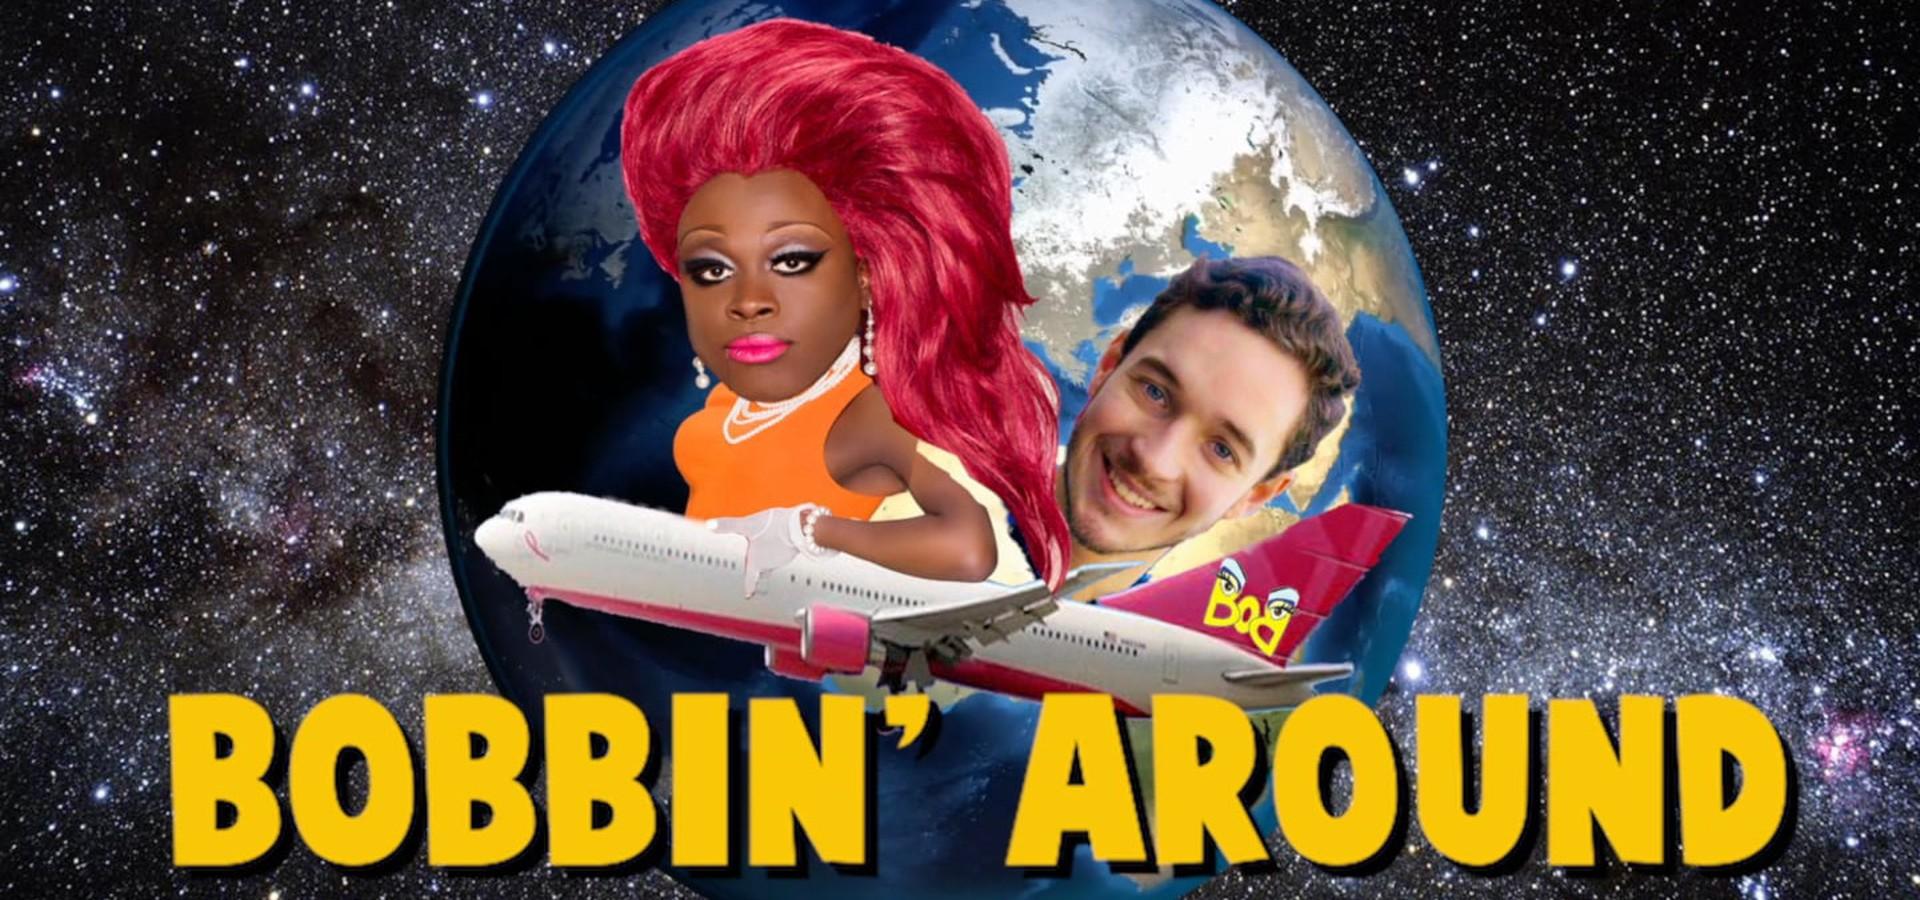 Bobbin Around with BOB the Drag Queen